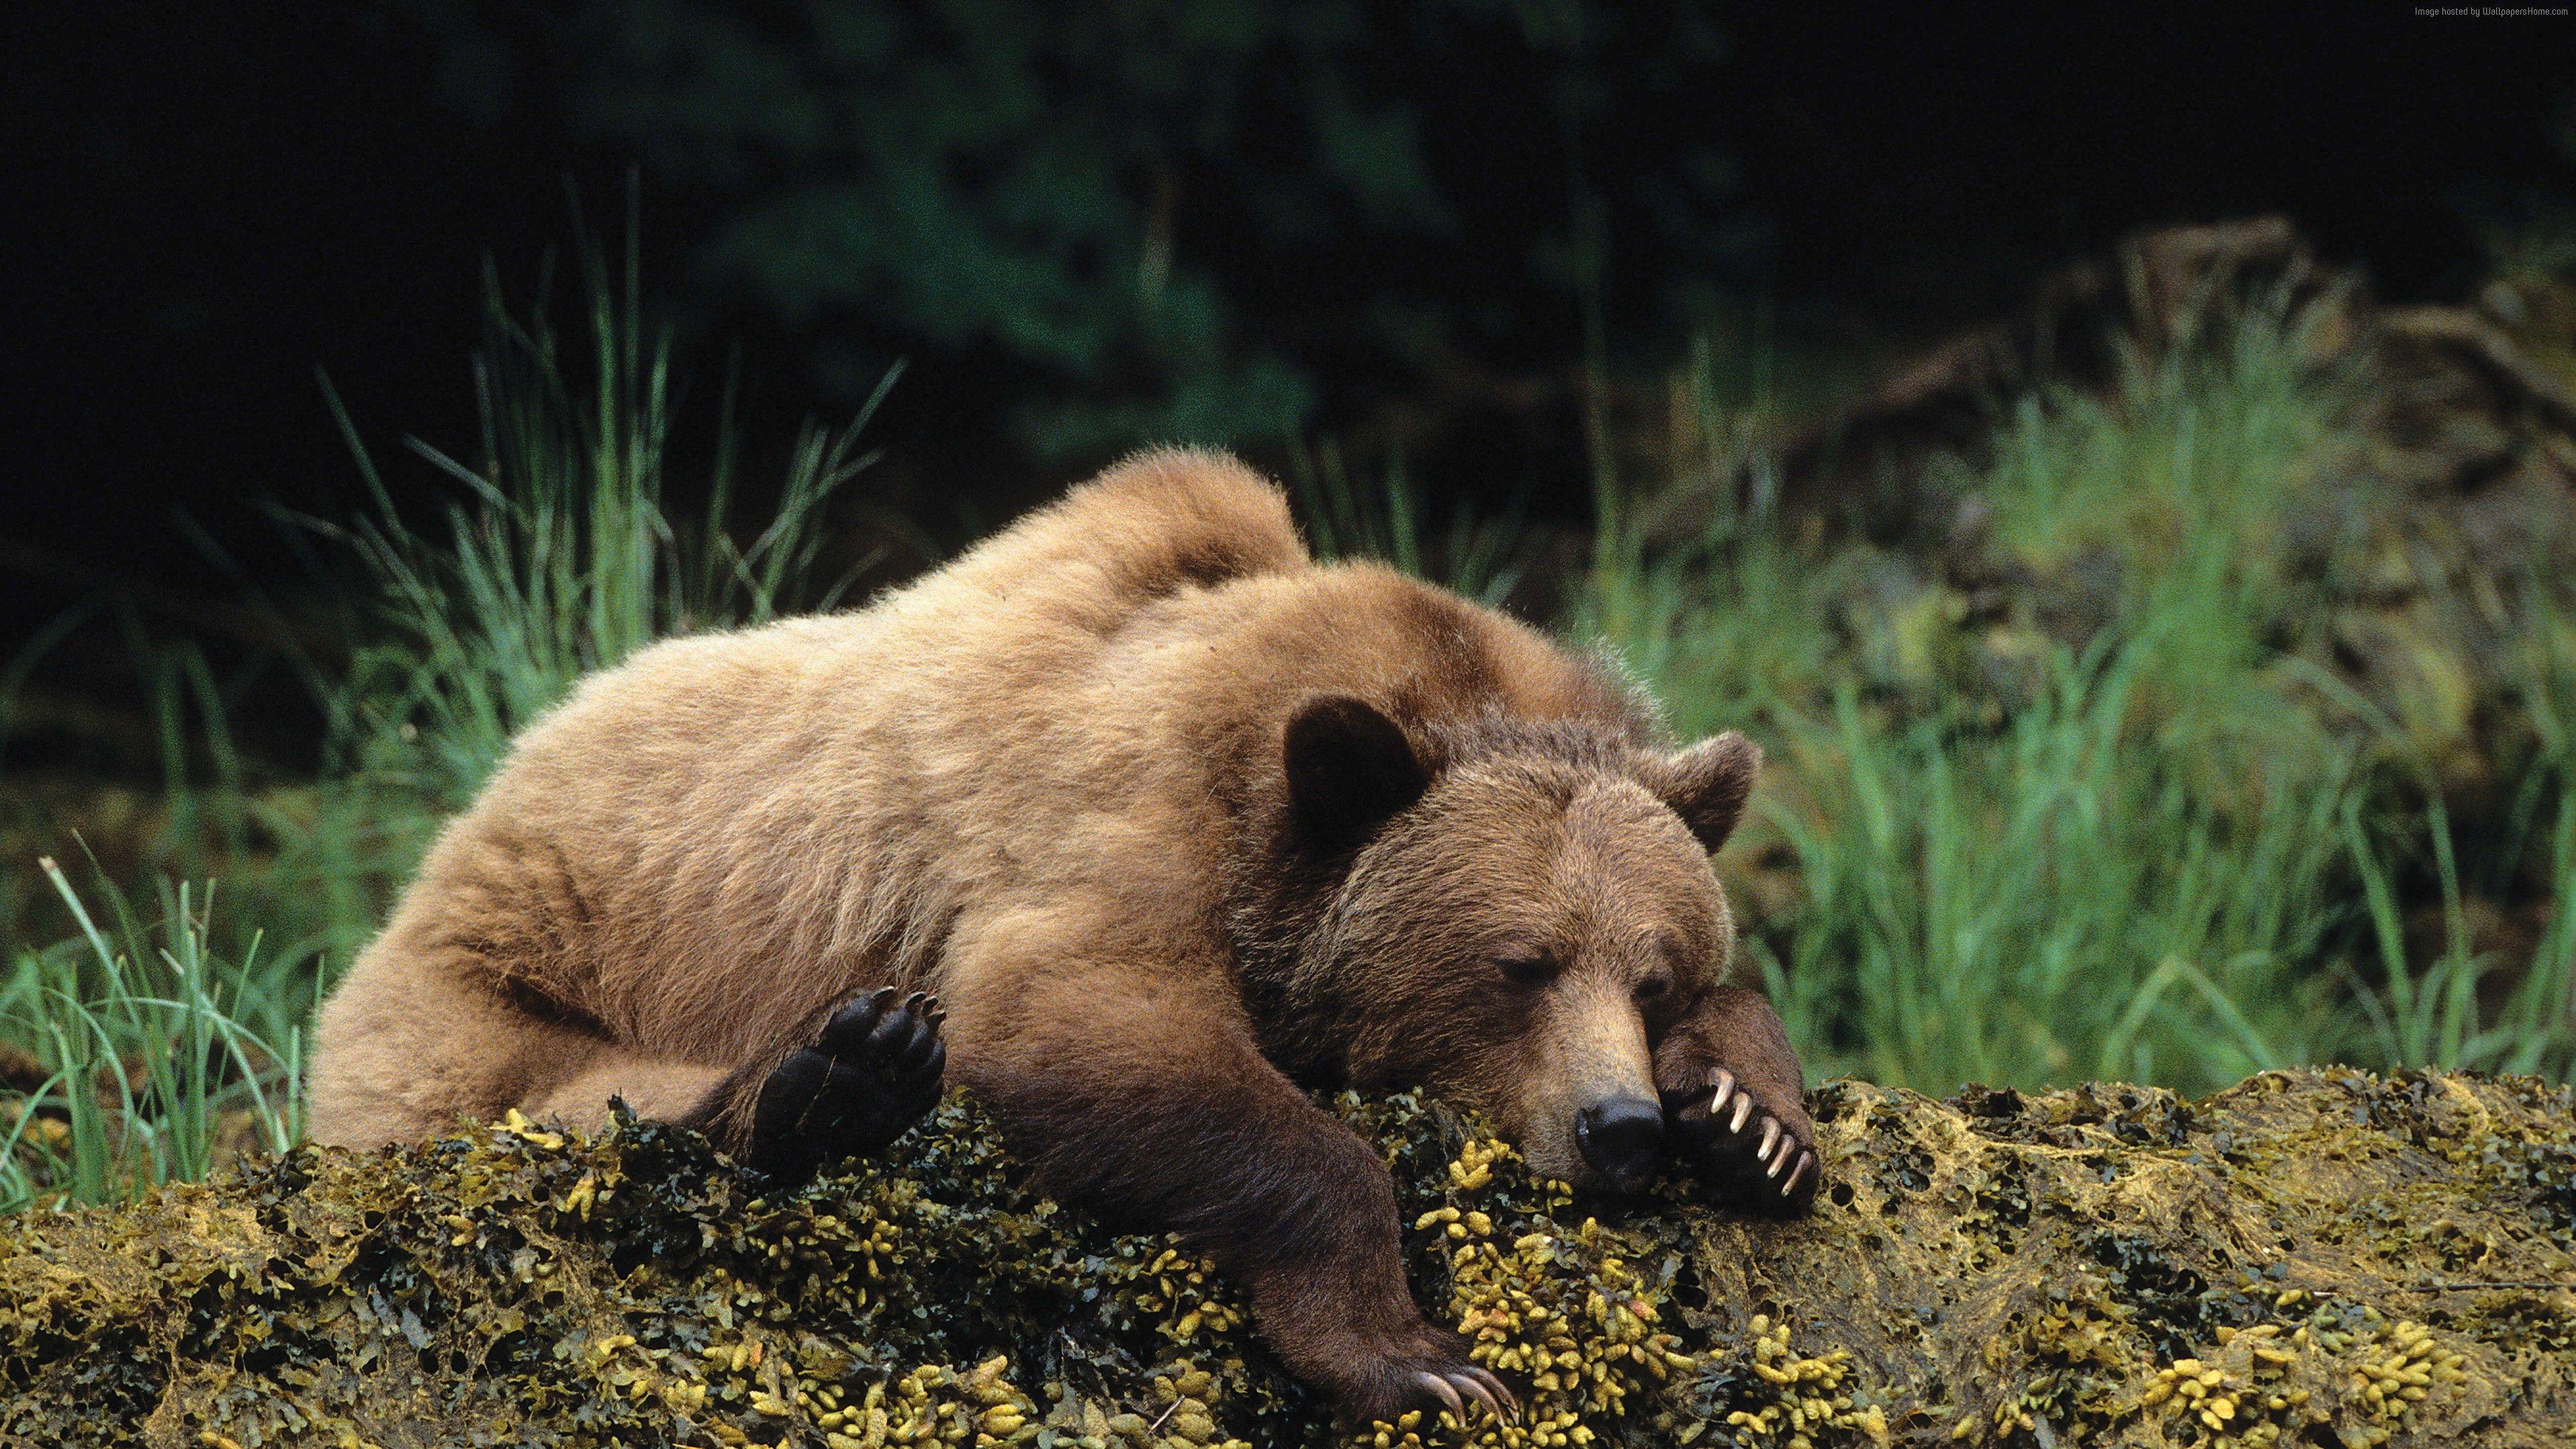 Wallpaper bear, cute animals, sleep, 4k, Animals Bear